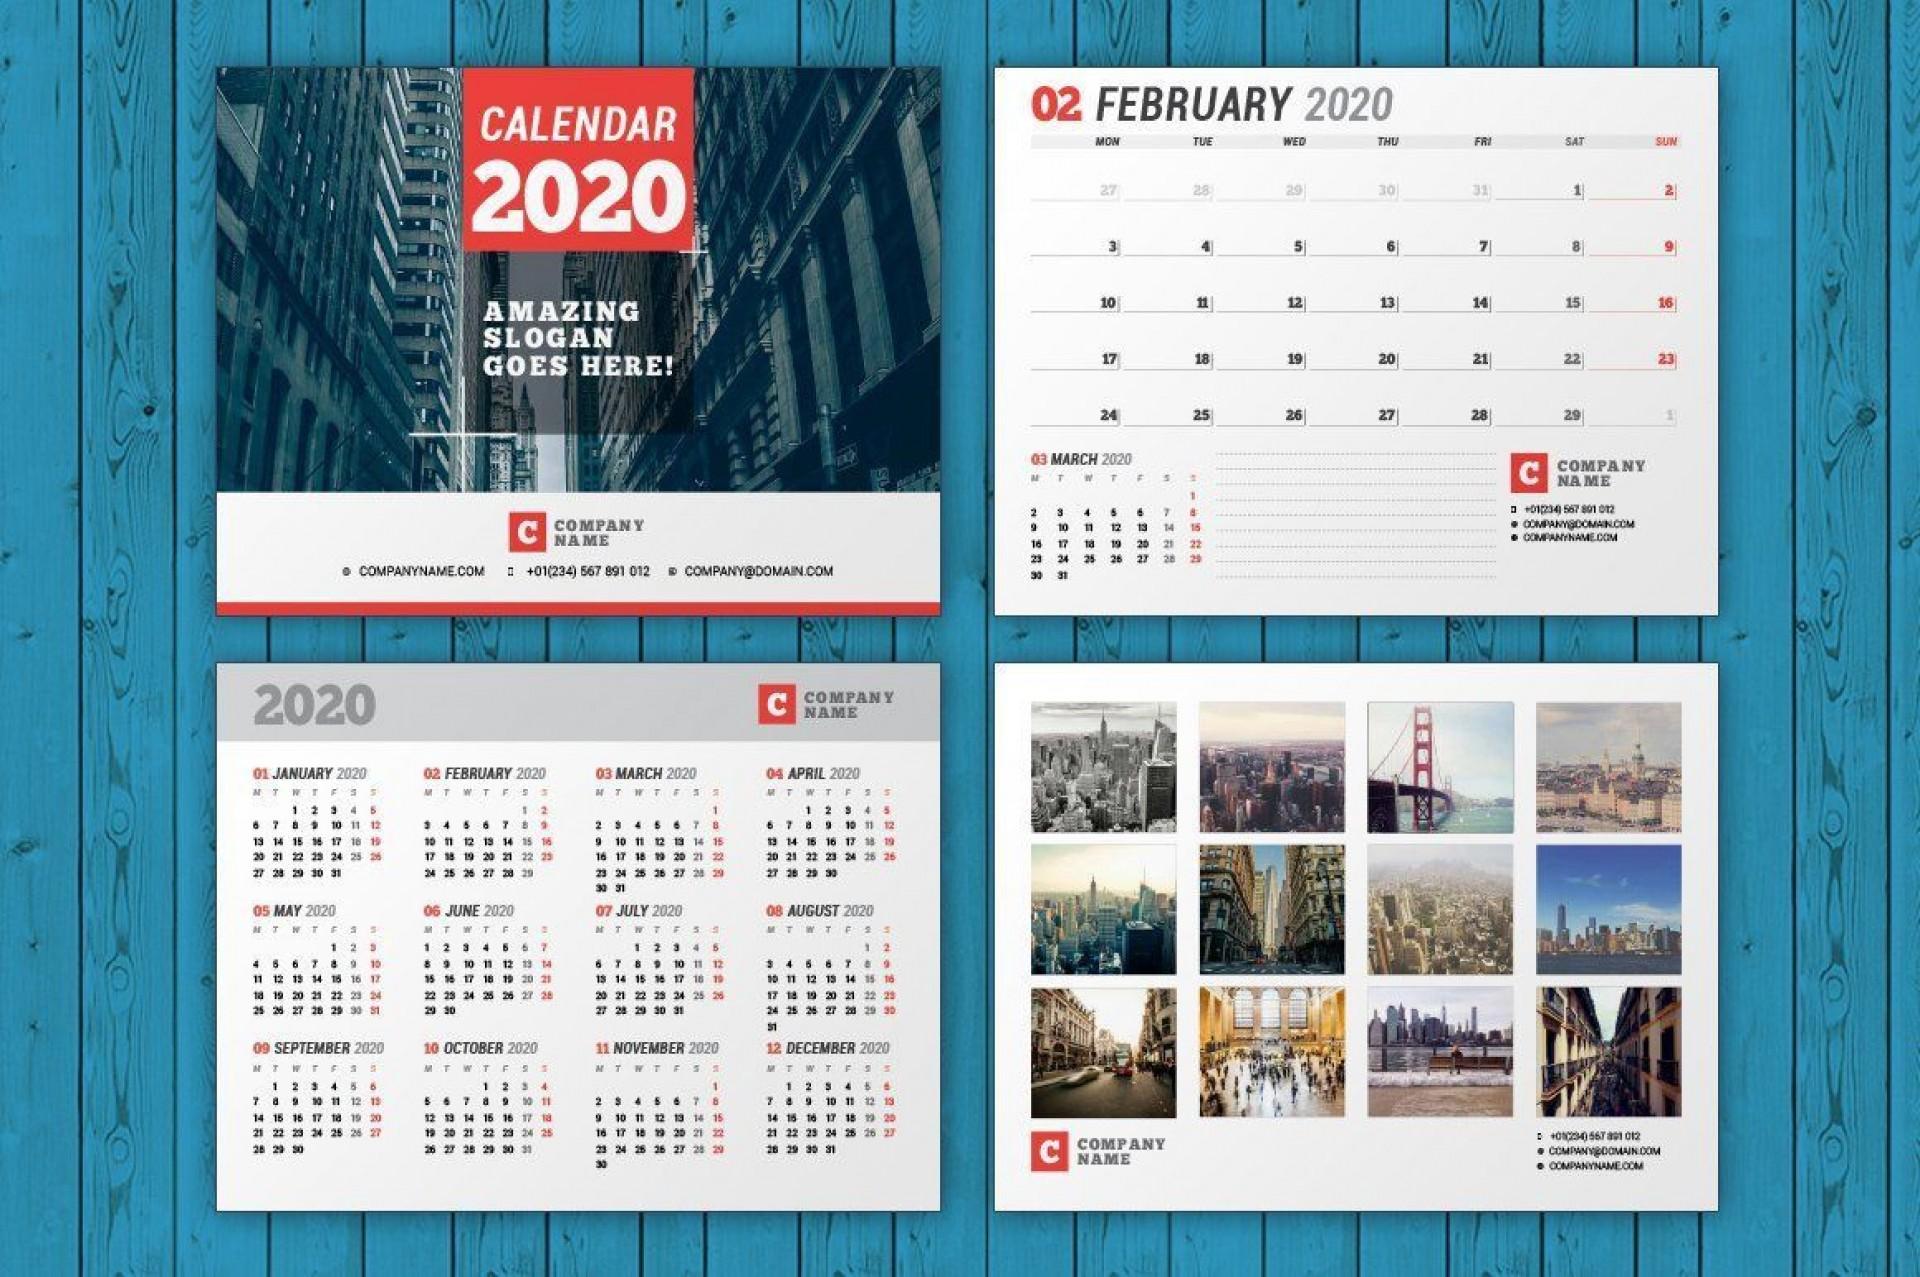 003 Unusual 2020 Calendar Template Indesign Inspiration  Adobe Free1920